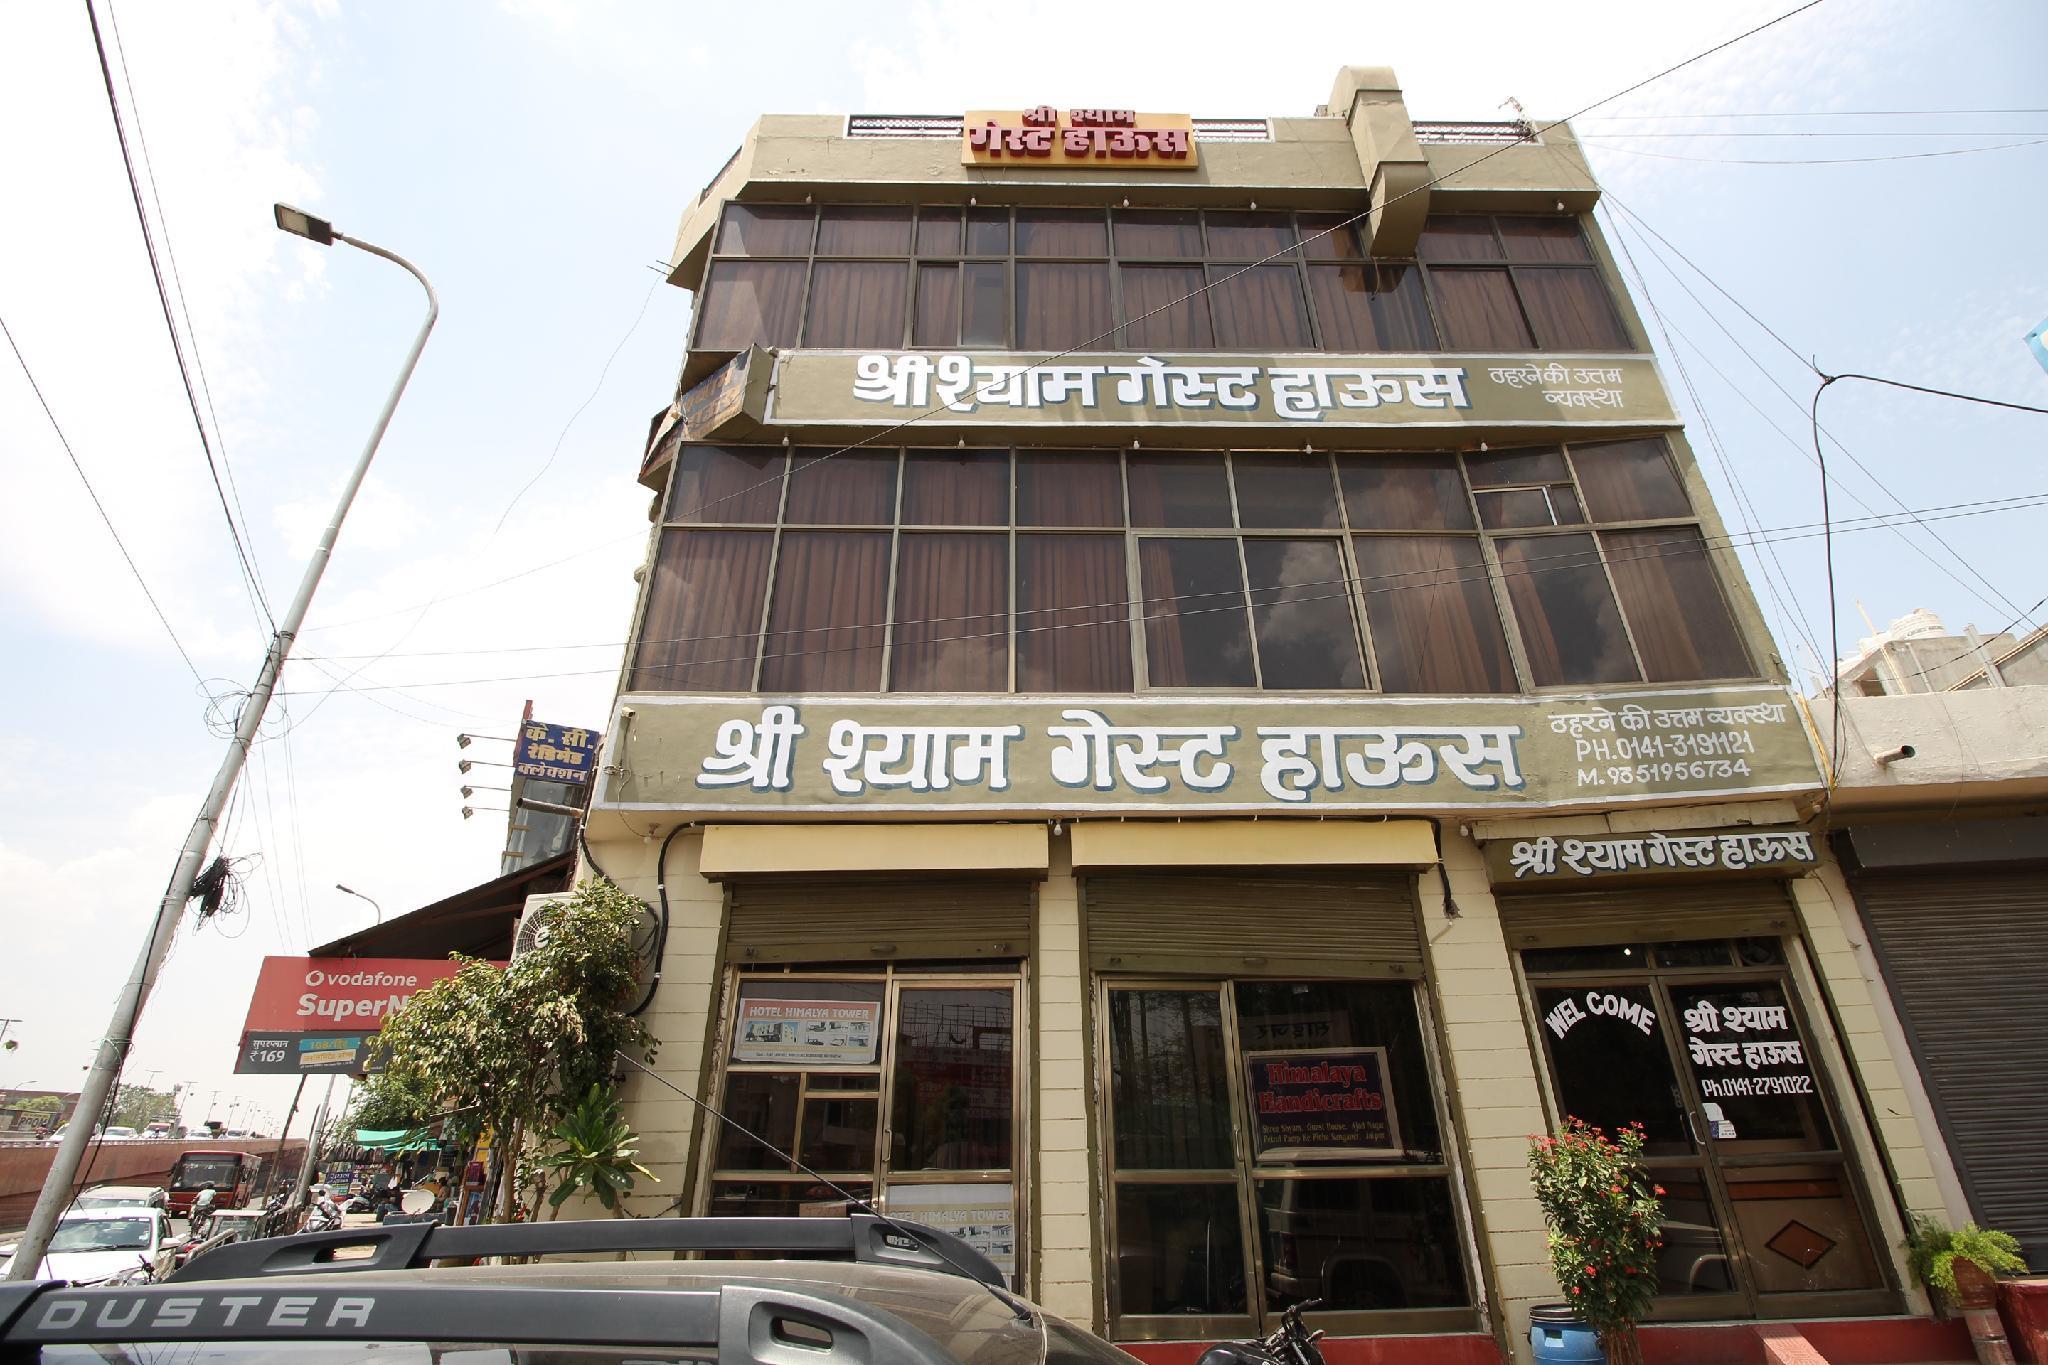 SPOT ON 38614 Shree Shyam Guest House